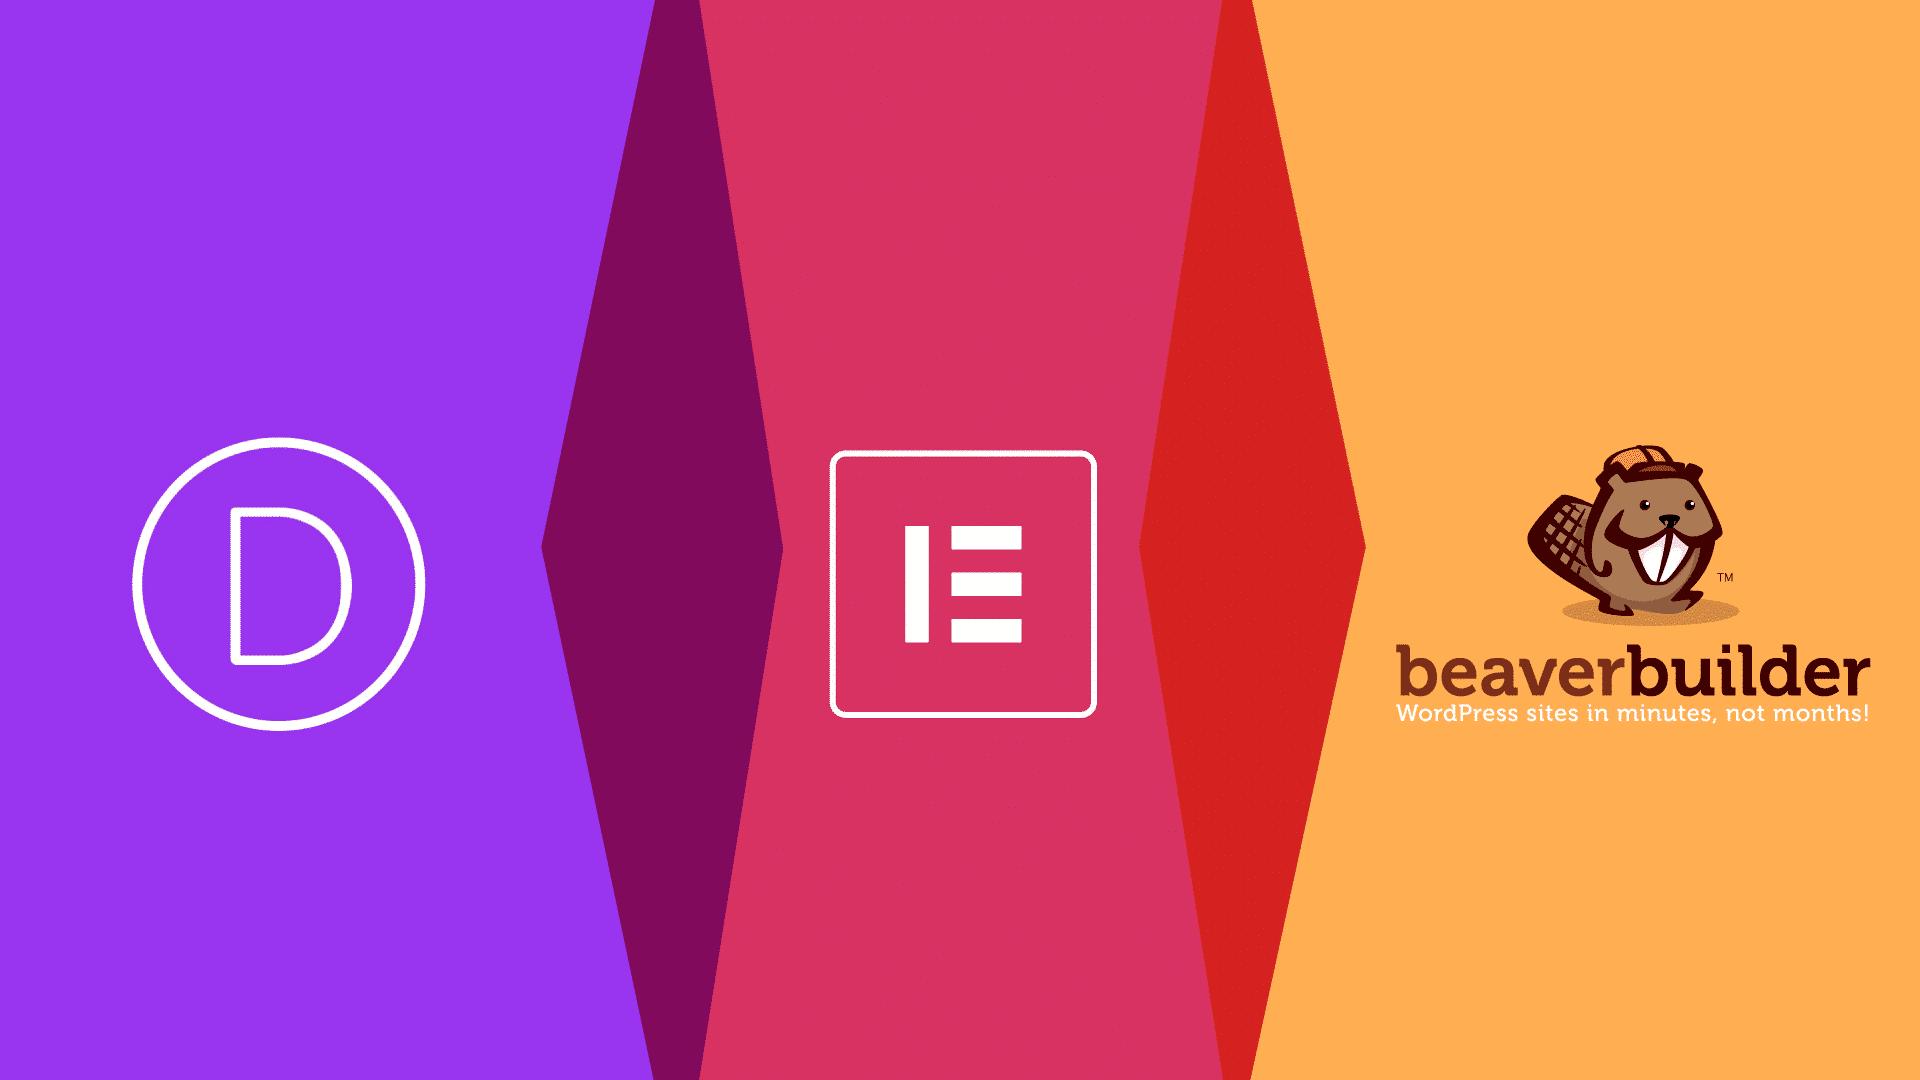 elementor-divi-beaver